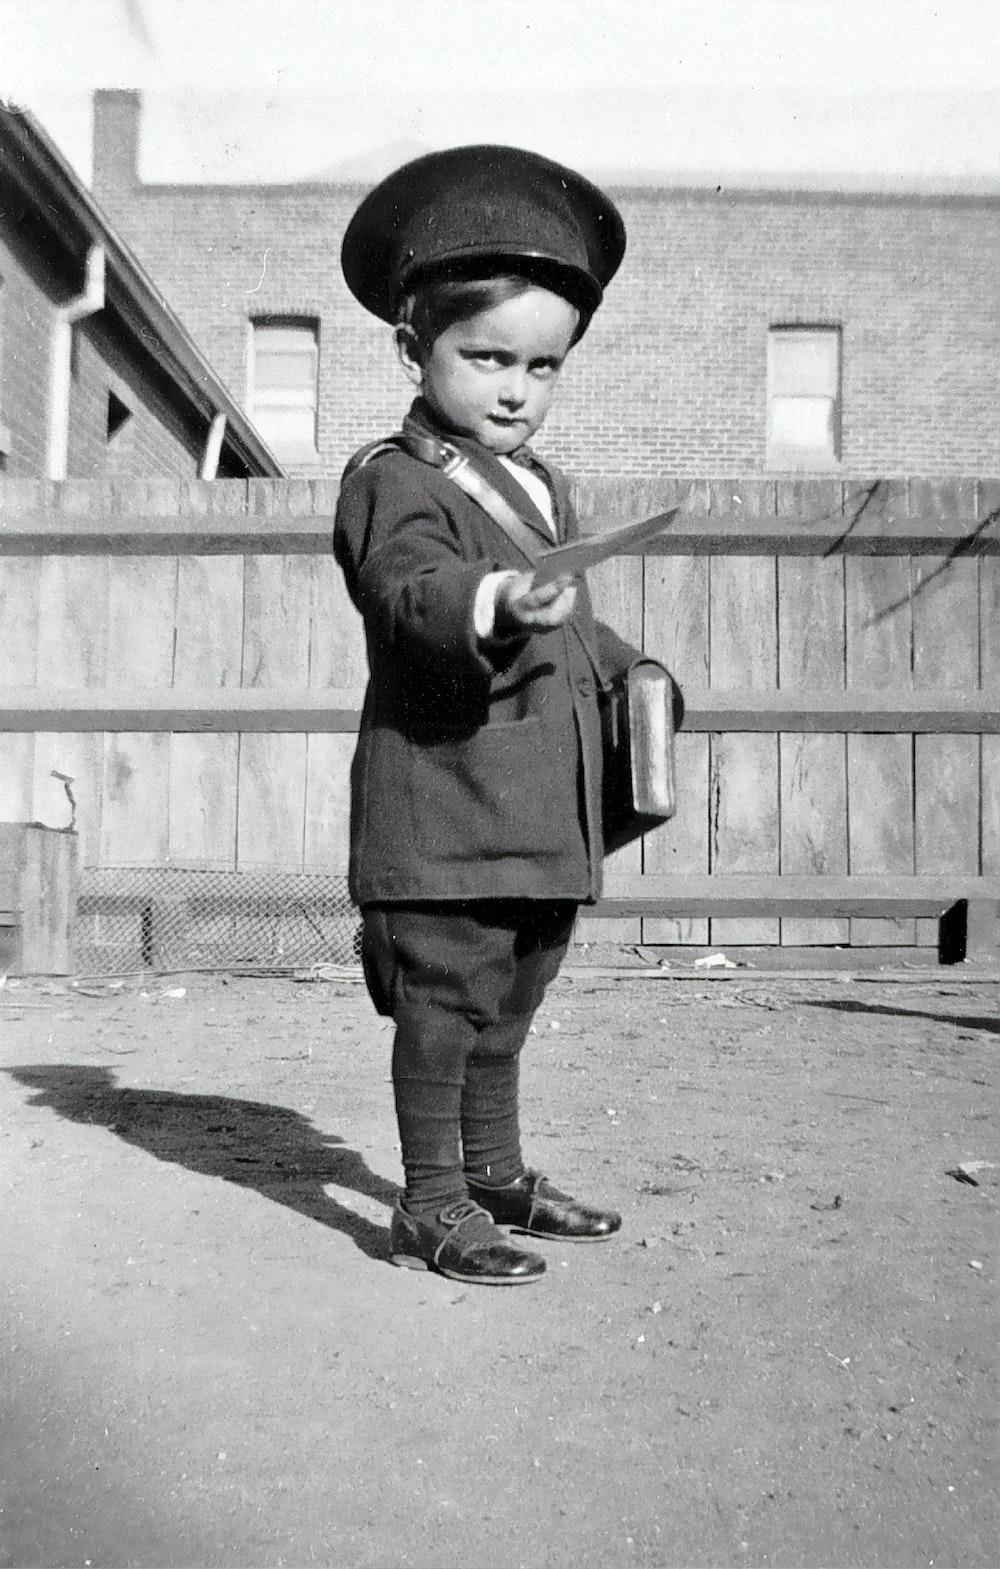 boy in black long sleeve shirt holding a stick